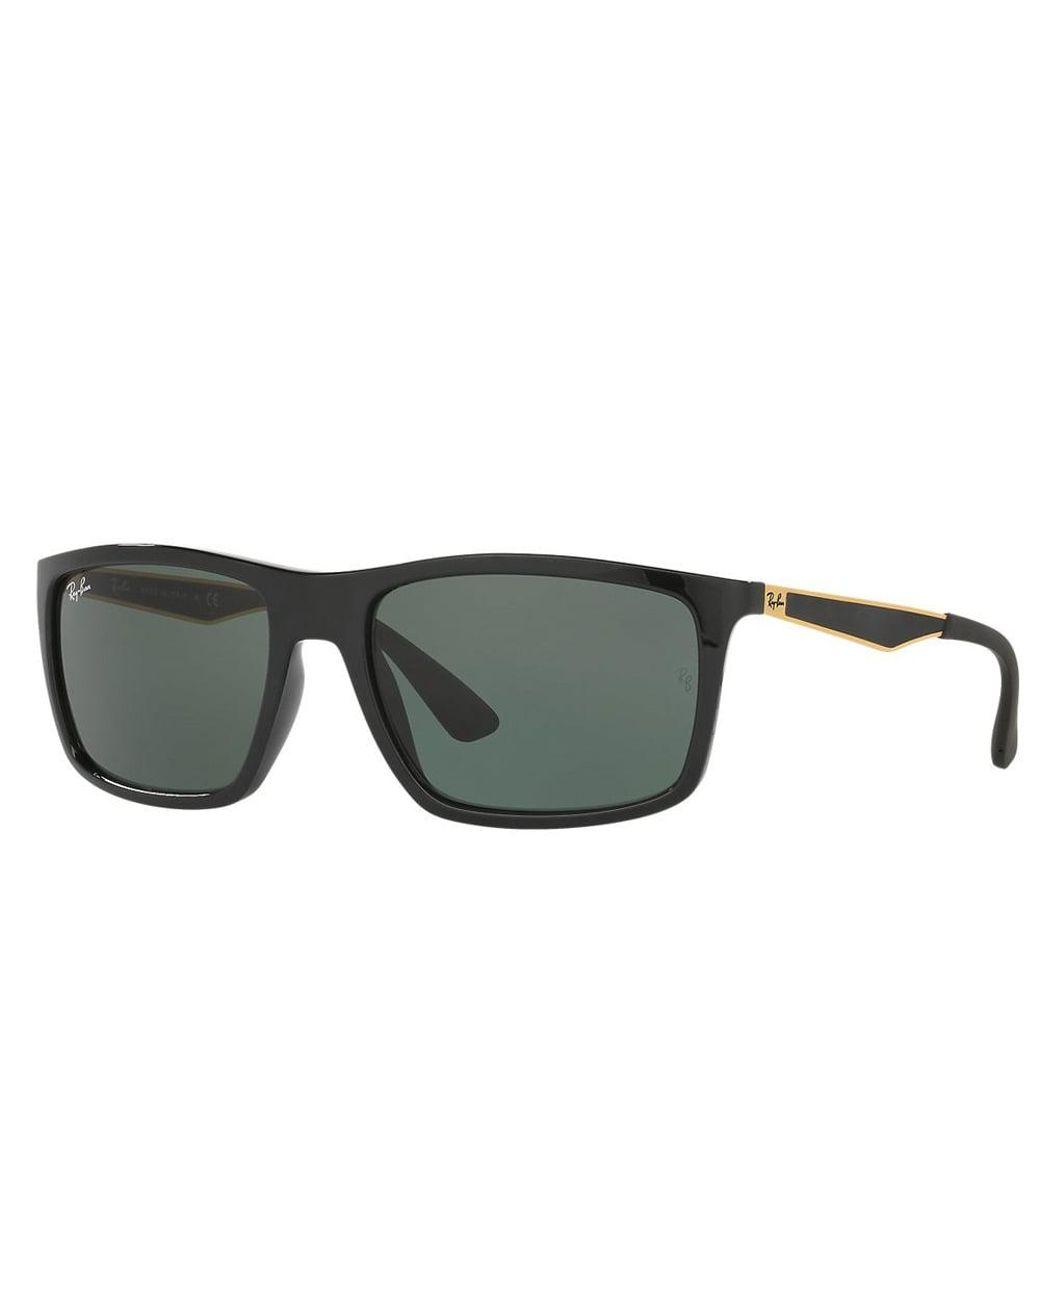 Men S Black Gold Rb4228 Sunglasses Green Classic Lenses